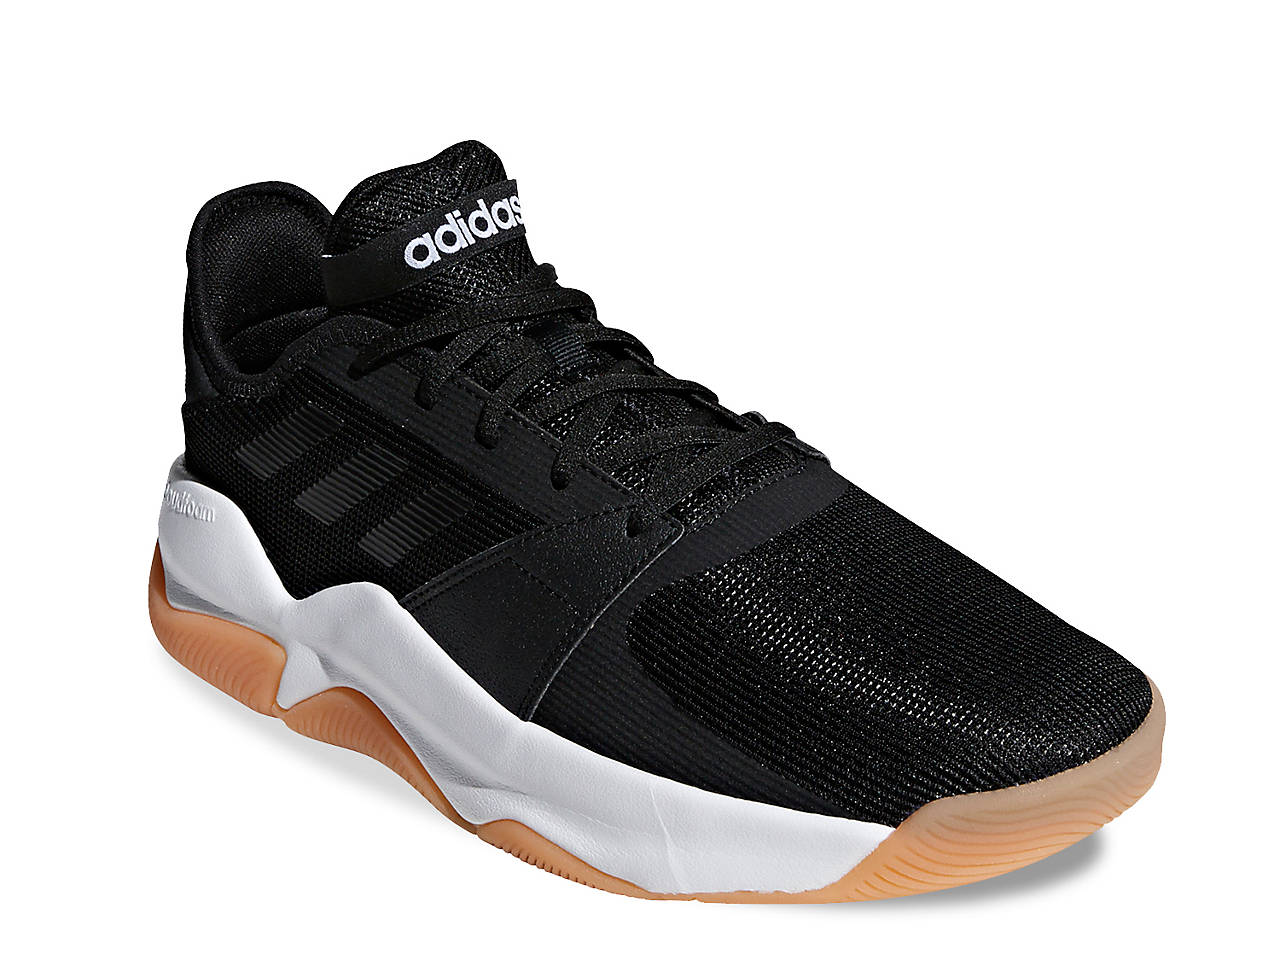 moins cher 31157 008bf Streetflow Basketball Shoe - Men's